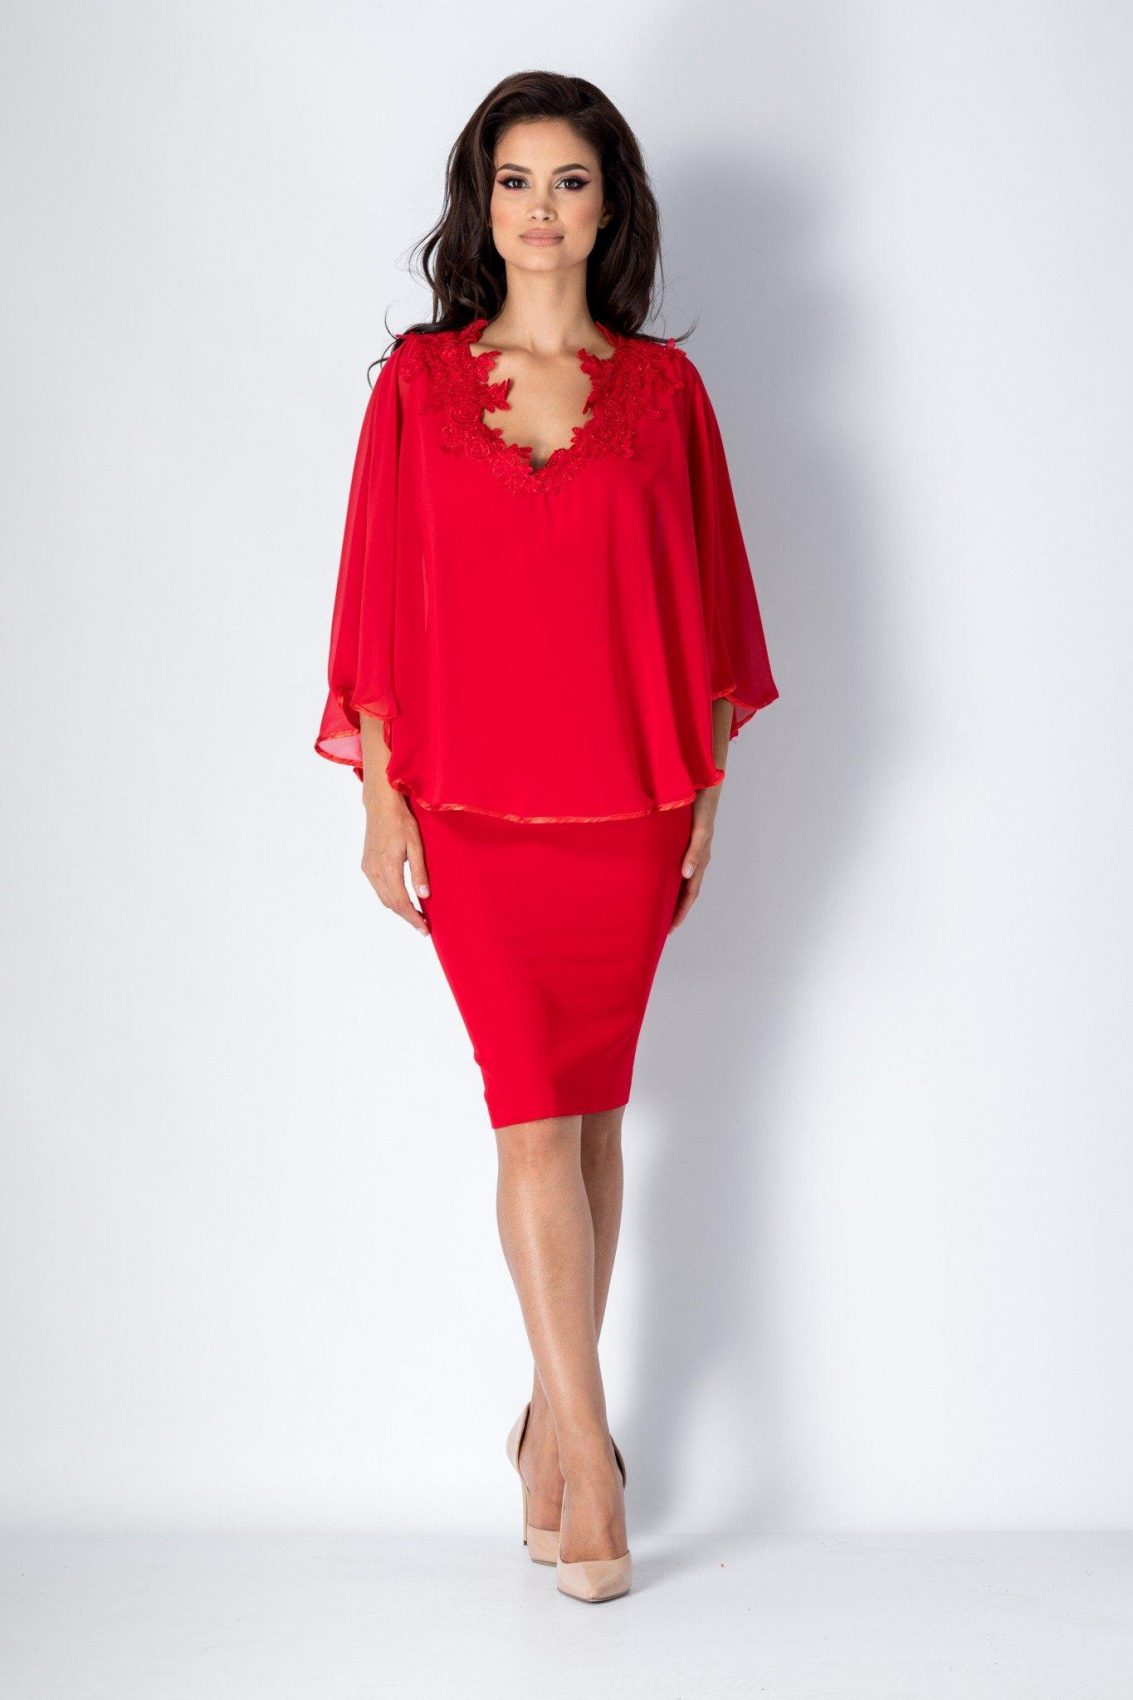 Calliope Κόκκινο Φόρεμα 1556